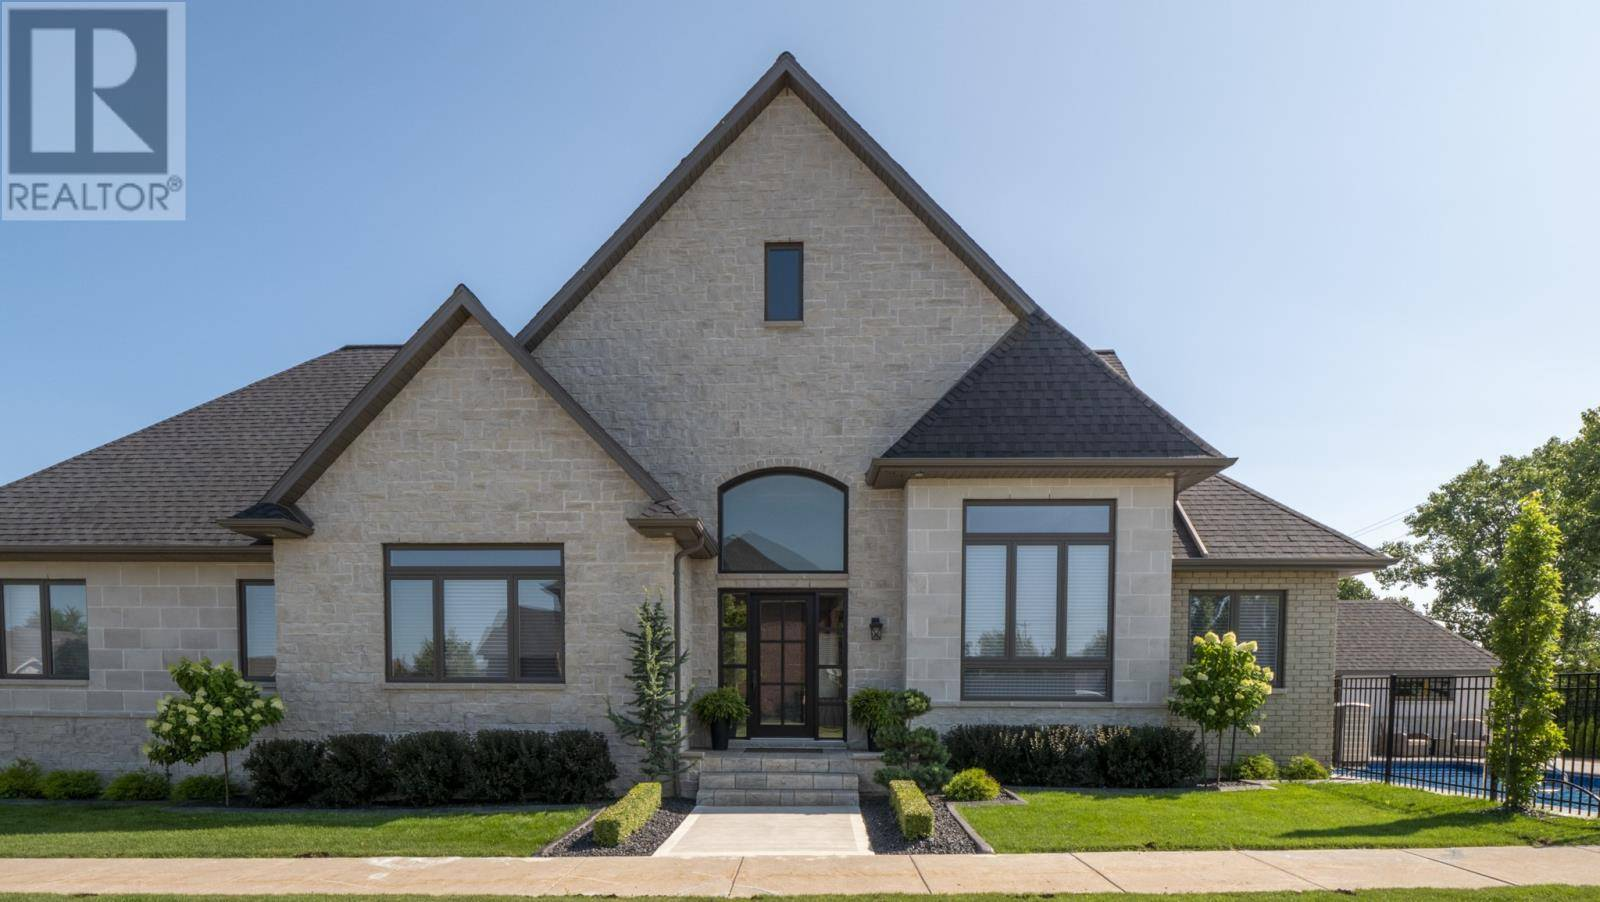 House for sale at 207 Ellison  Leamington Ontario - MLS: 19023084